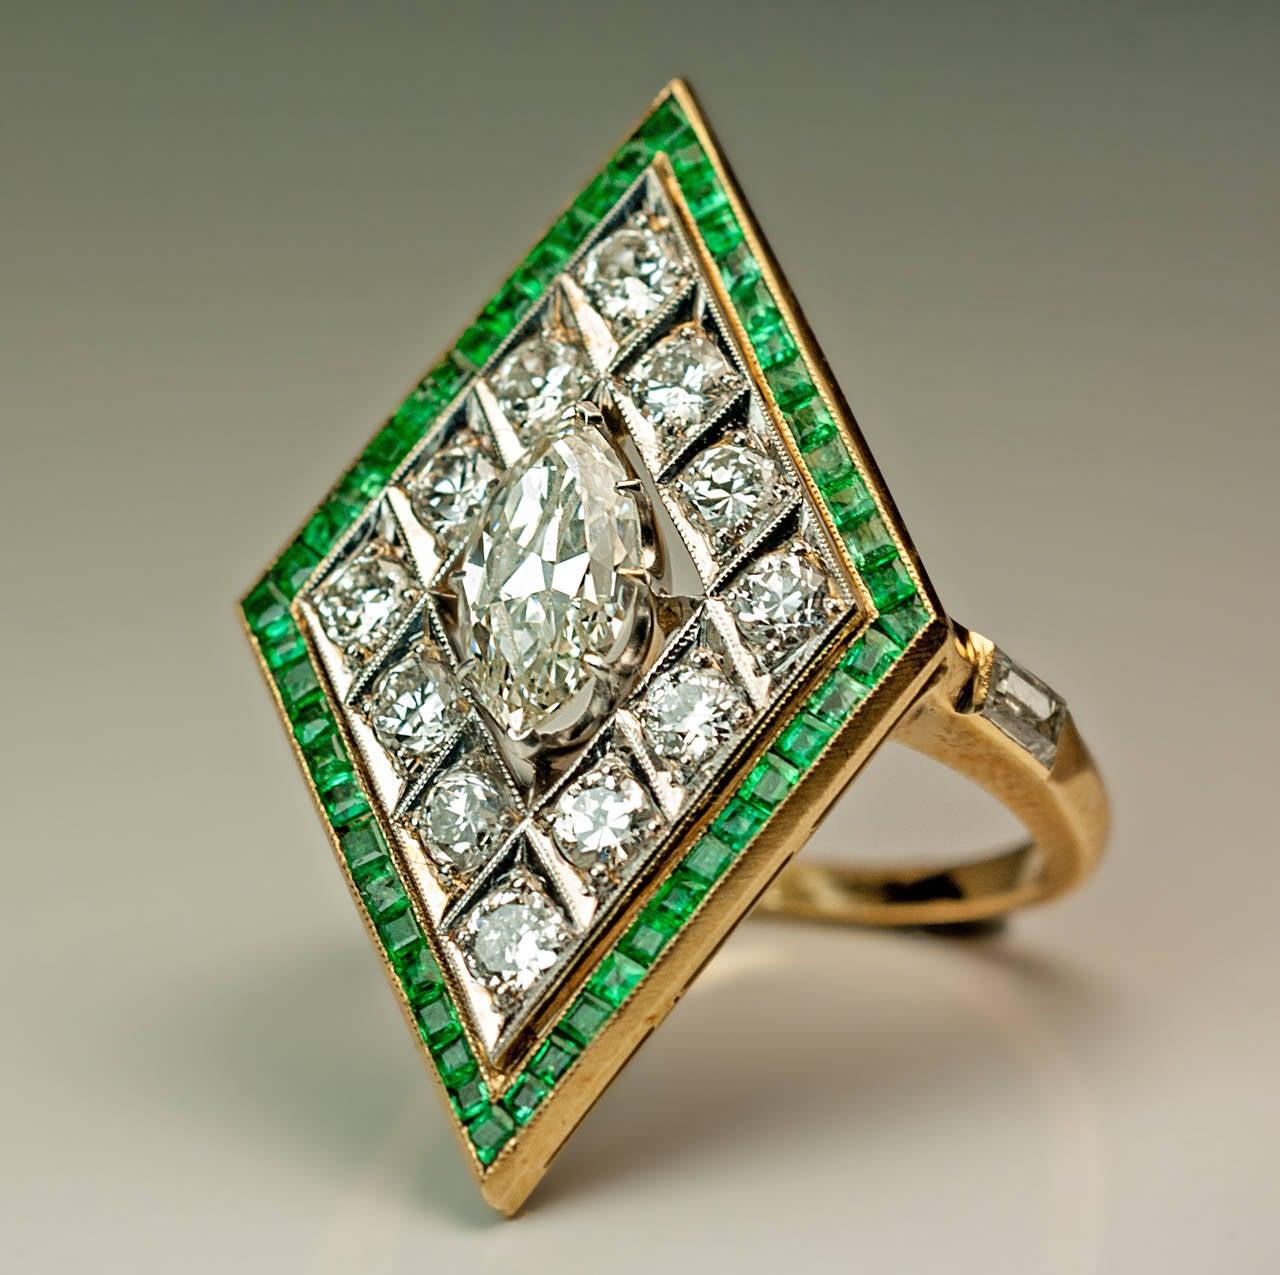 Art Deco Rhombus Shaped Diamond Emerald Gold Ring For Sale 1